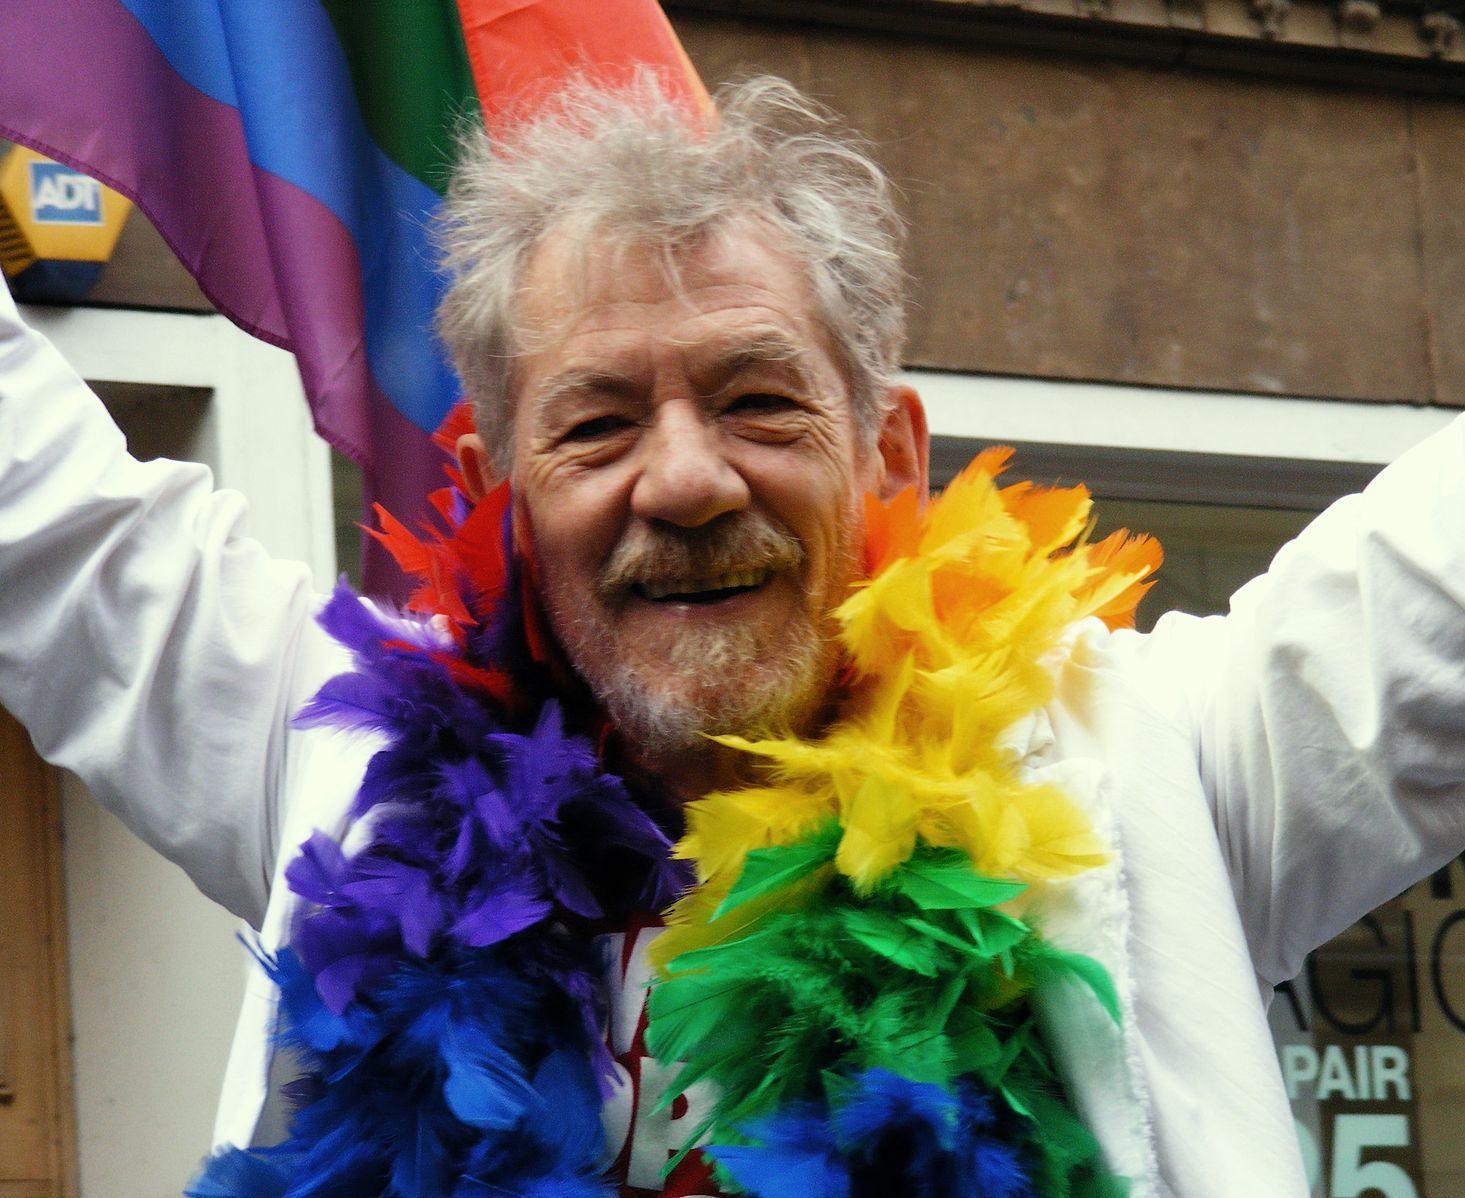 Sir Ian McKellen at Manchester Pride last month